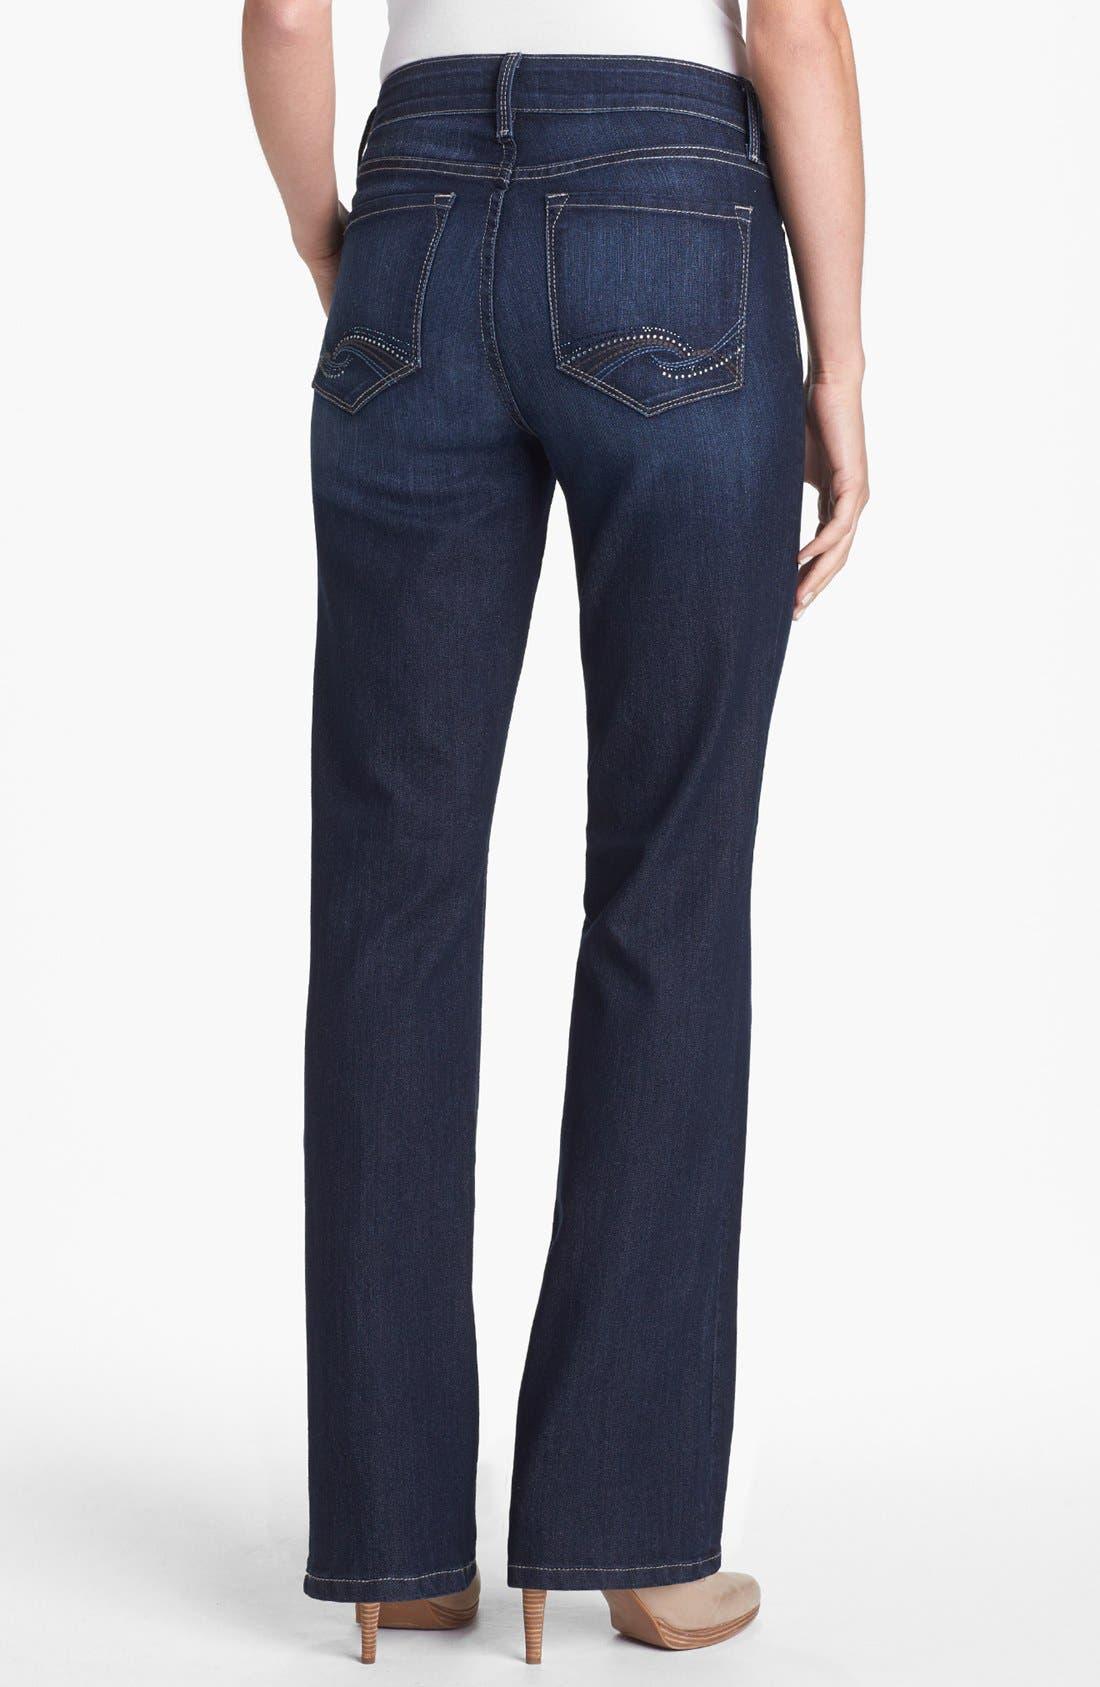 Alternate Image 3  - NYDJ 'Barbara' Embellished Pocket Stretch Bootcut Jeans (Hollywood) (Regular & Petite)